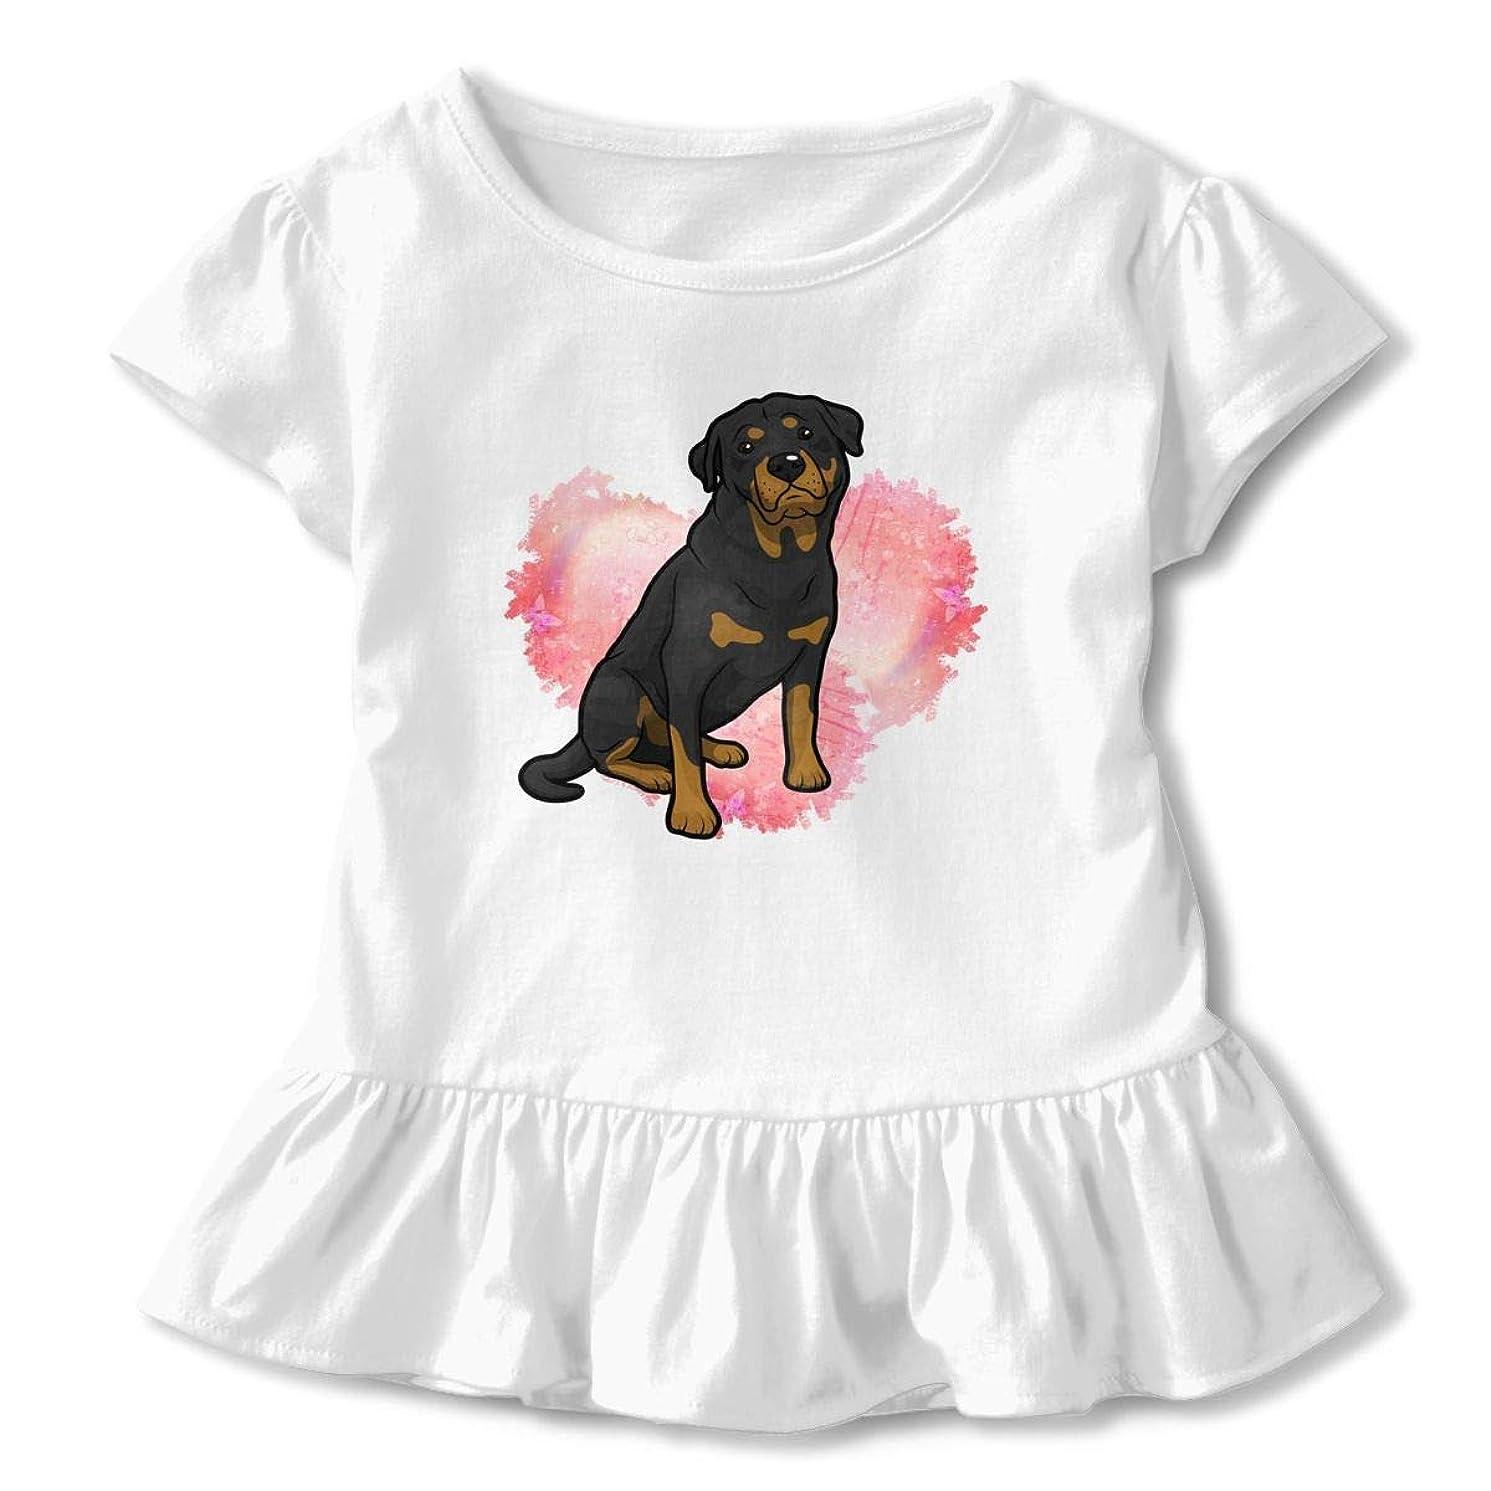 SDHEIJKY Love Rottweiler Heart Toddler Baby Girls' Short Sleeve Ruffle T-Shirt